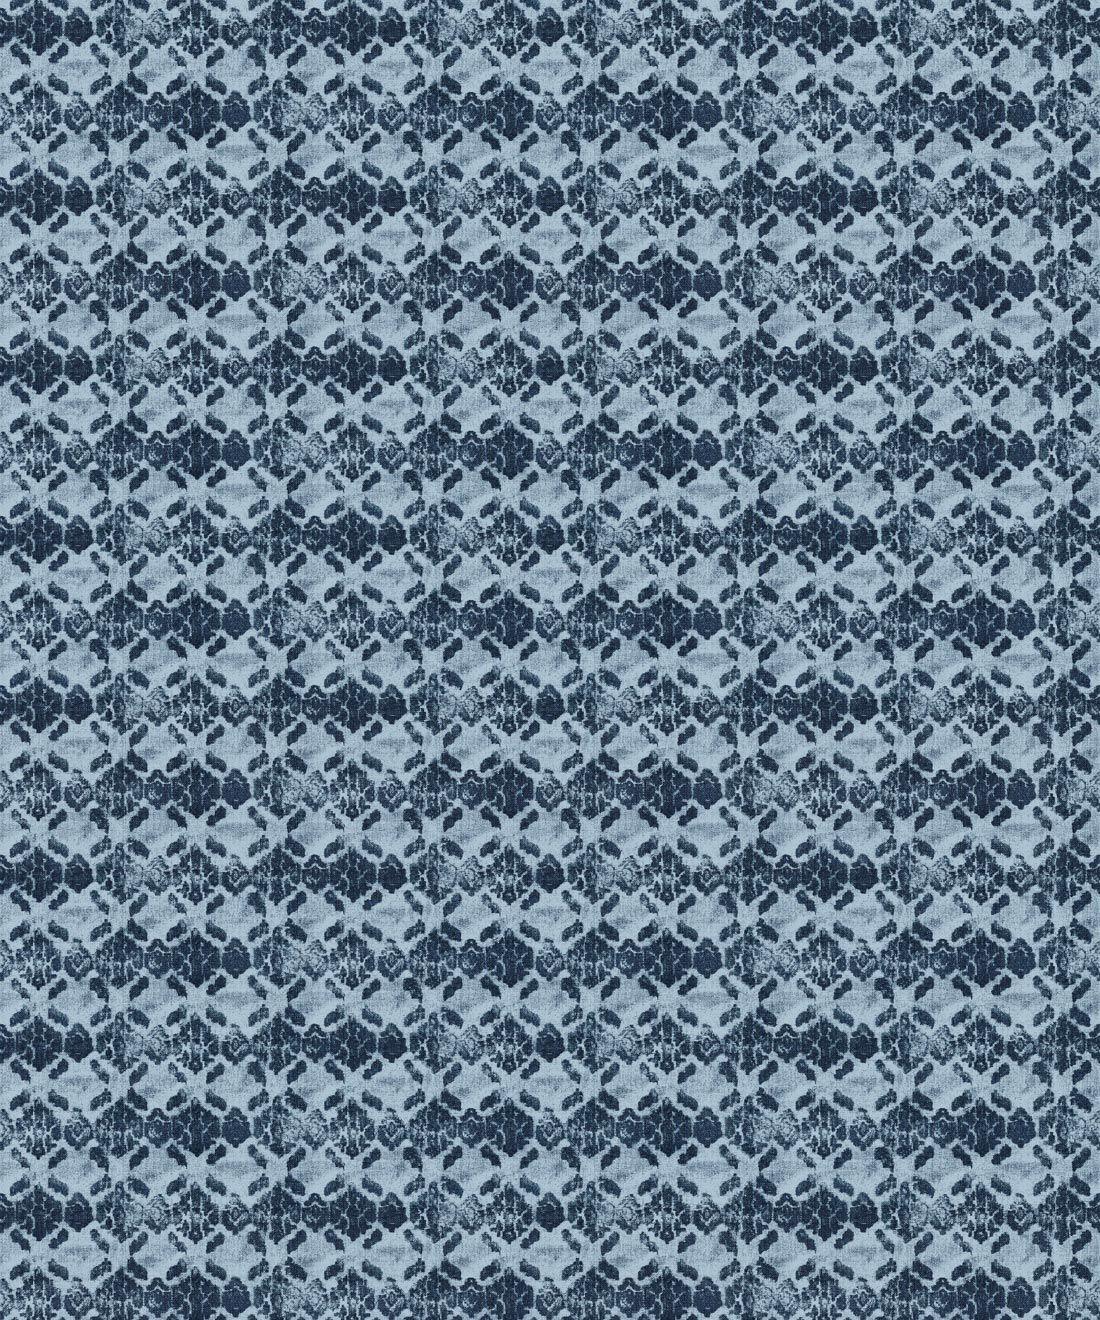 Indigo Blue Ikat Wallpaper • Shibori